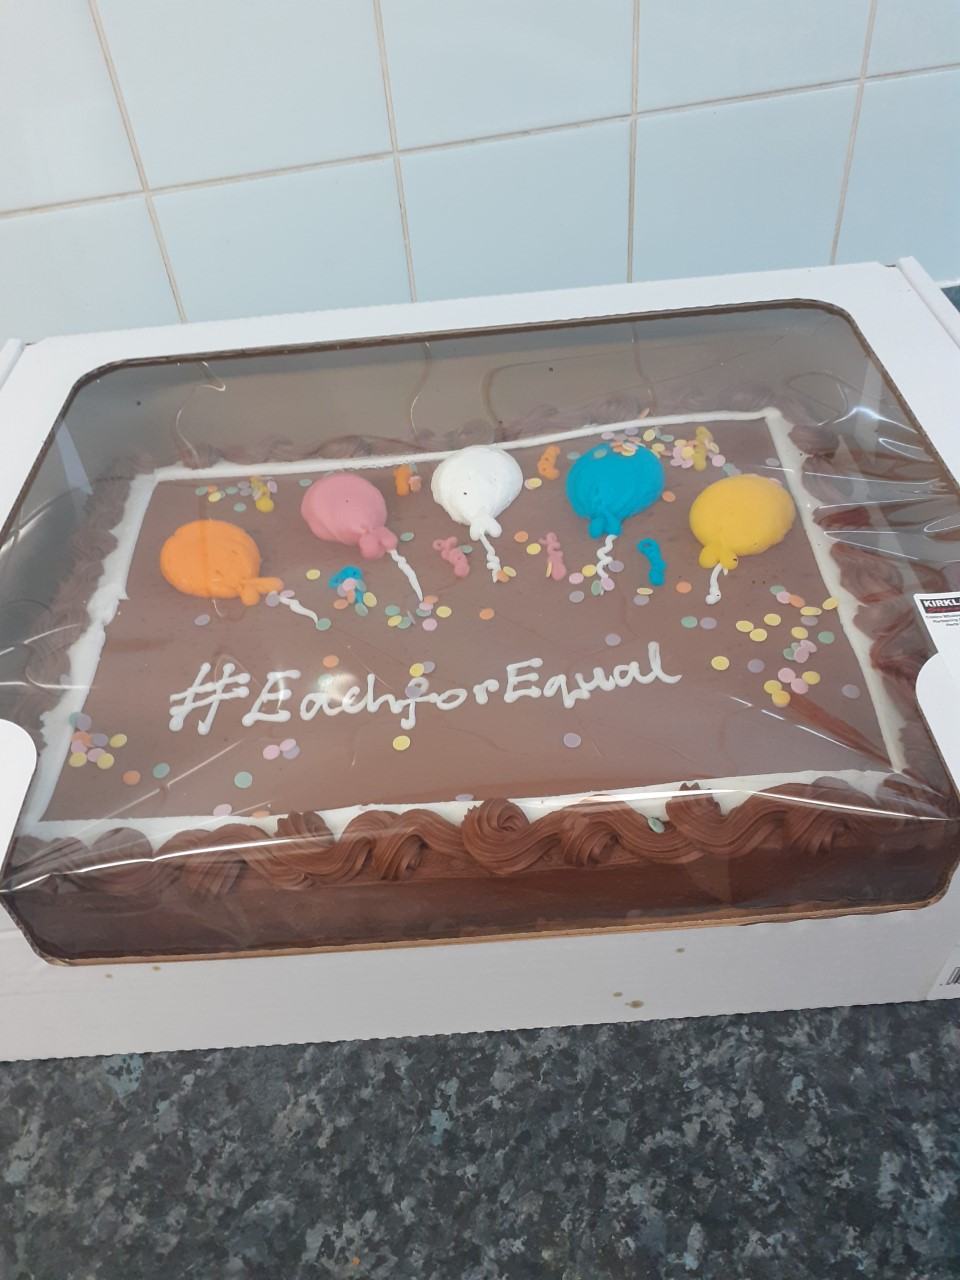 International Womens Day EachForEqual cake